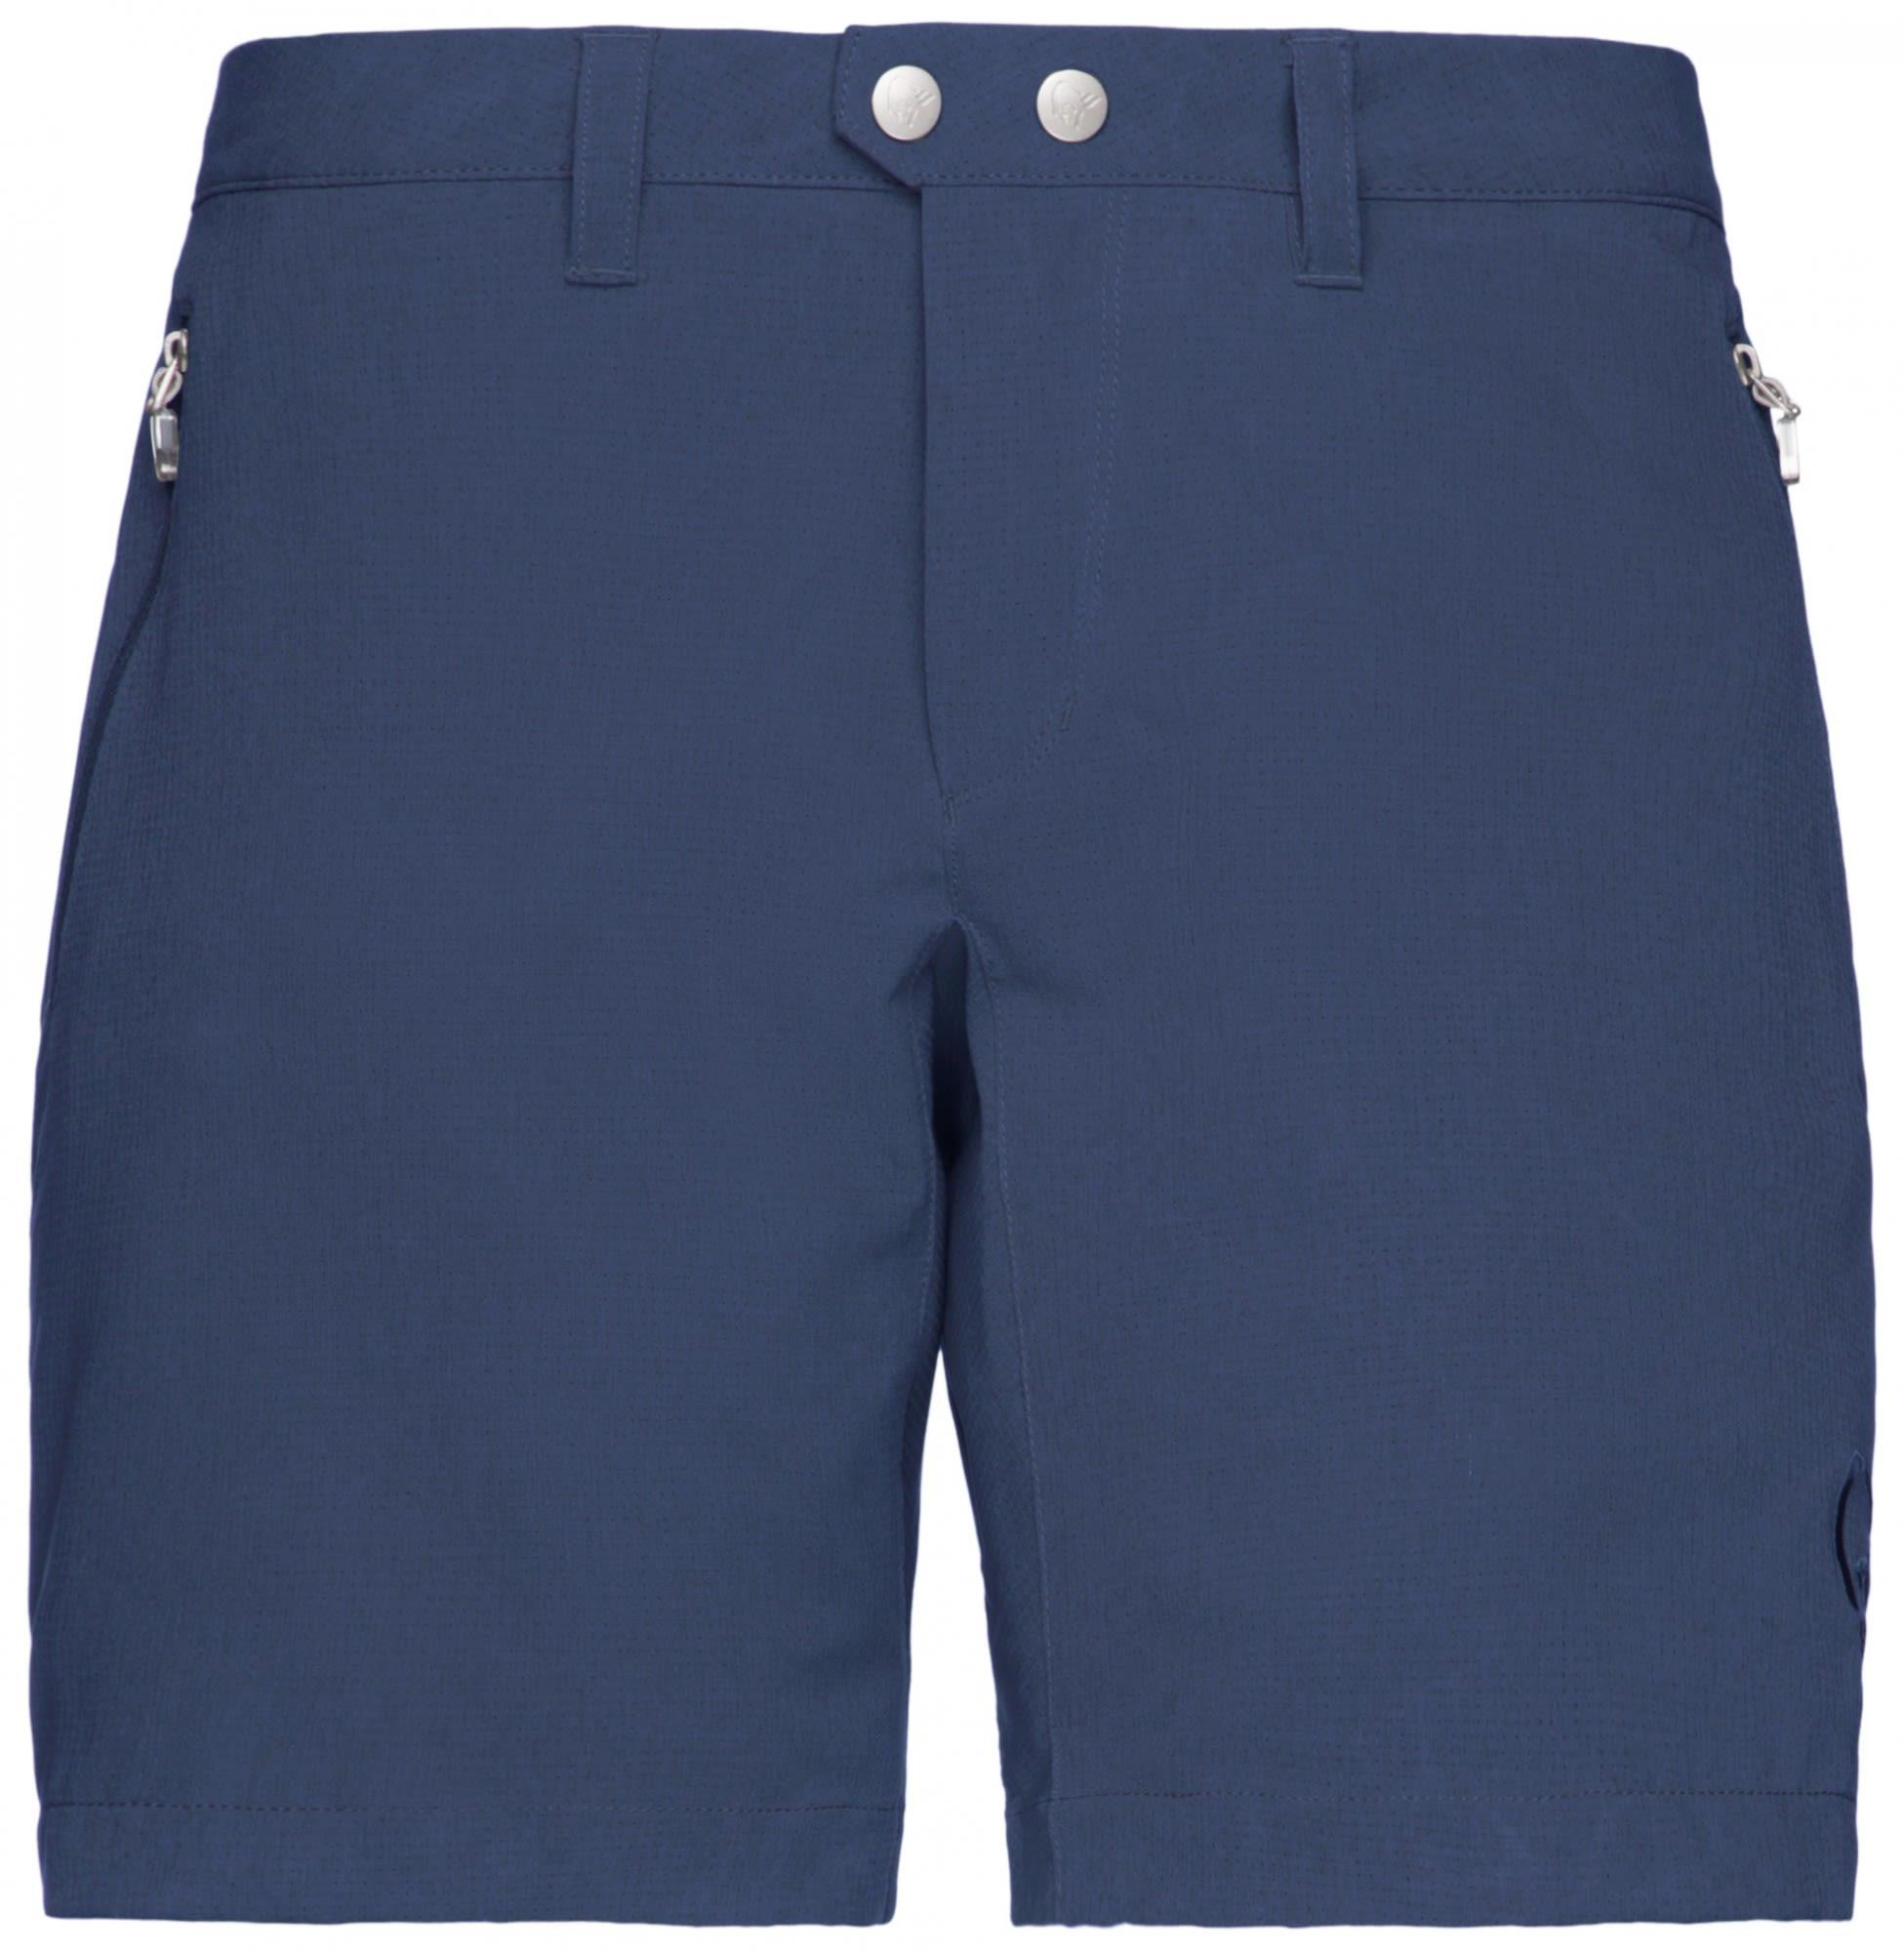 Norrona Bitihorn Flex1 Shorts Blau, Female Shorts, XS